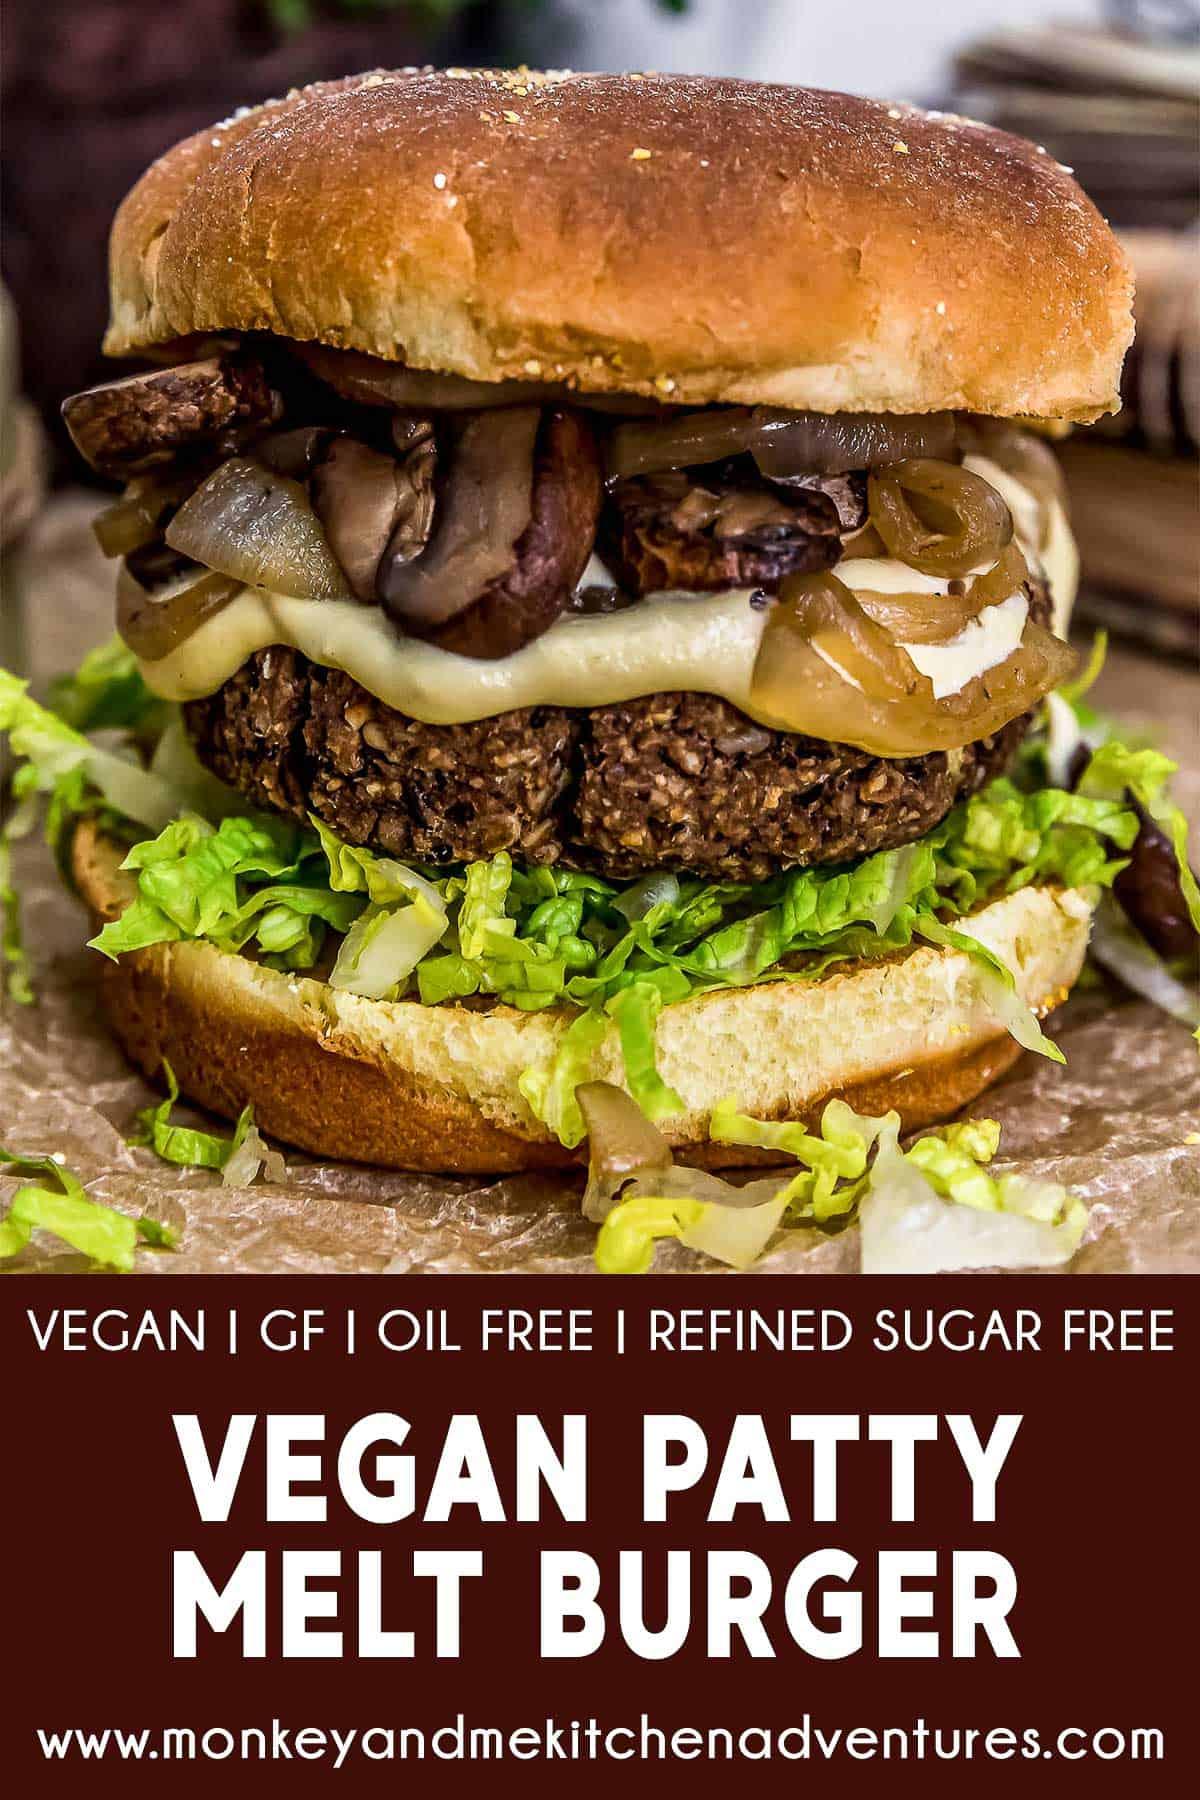 Vegan Patty Melt Burger with text description